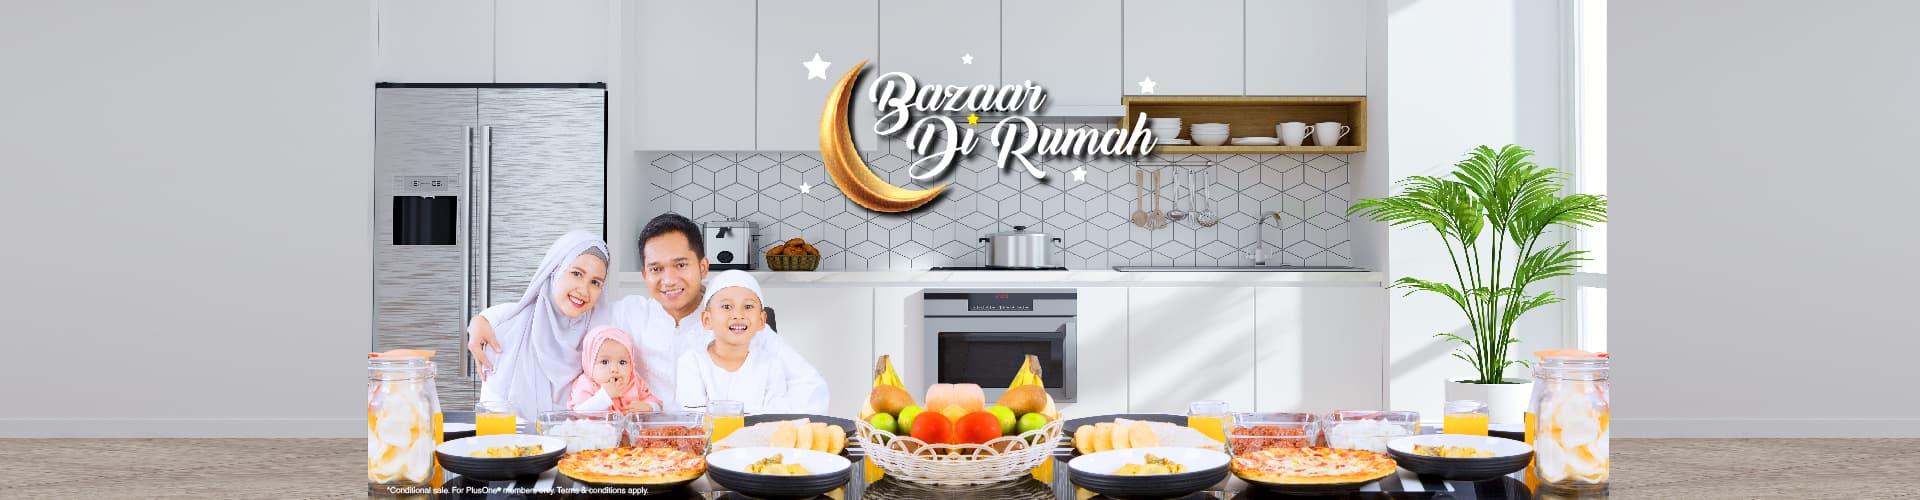 Ramadan Bazaar Landing Page